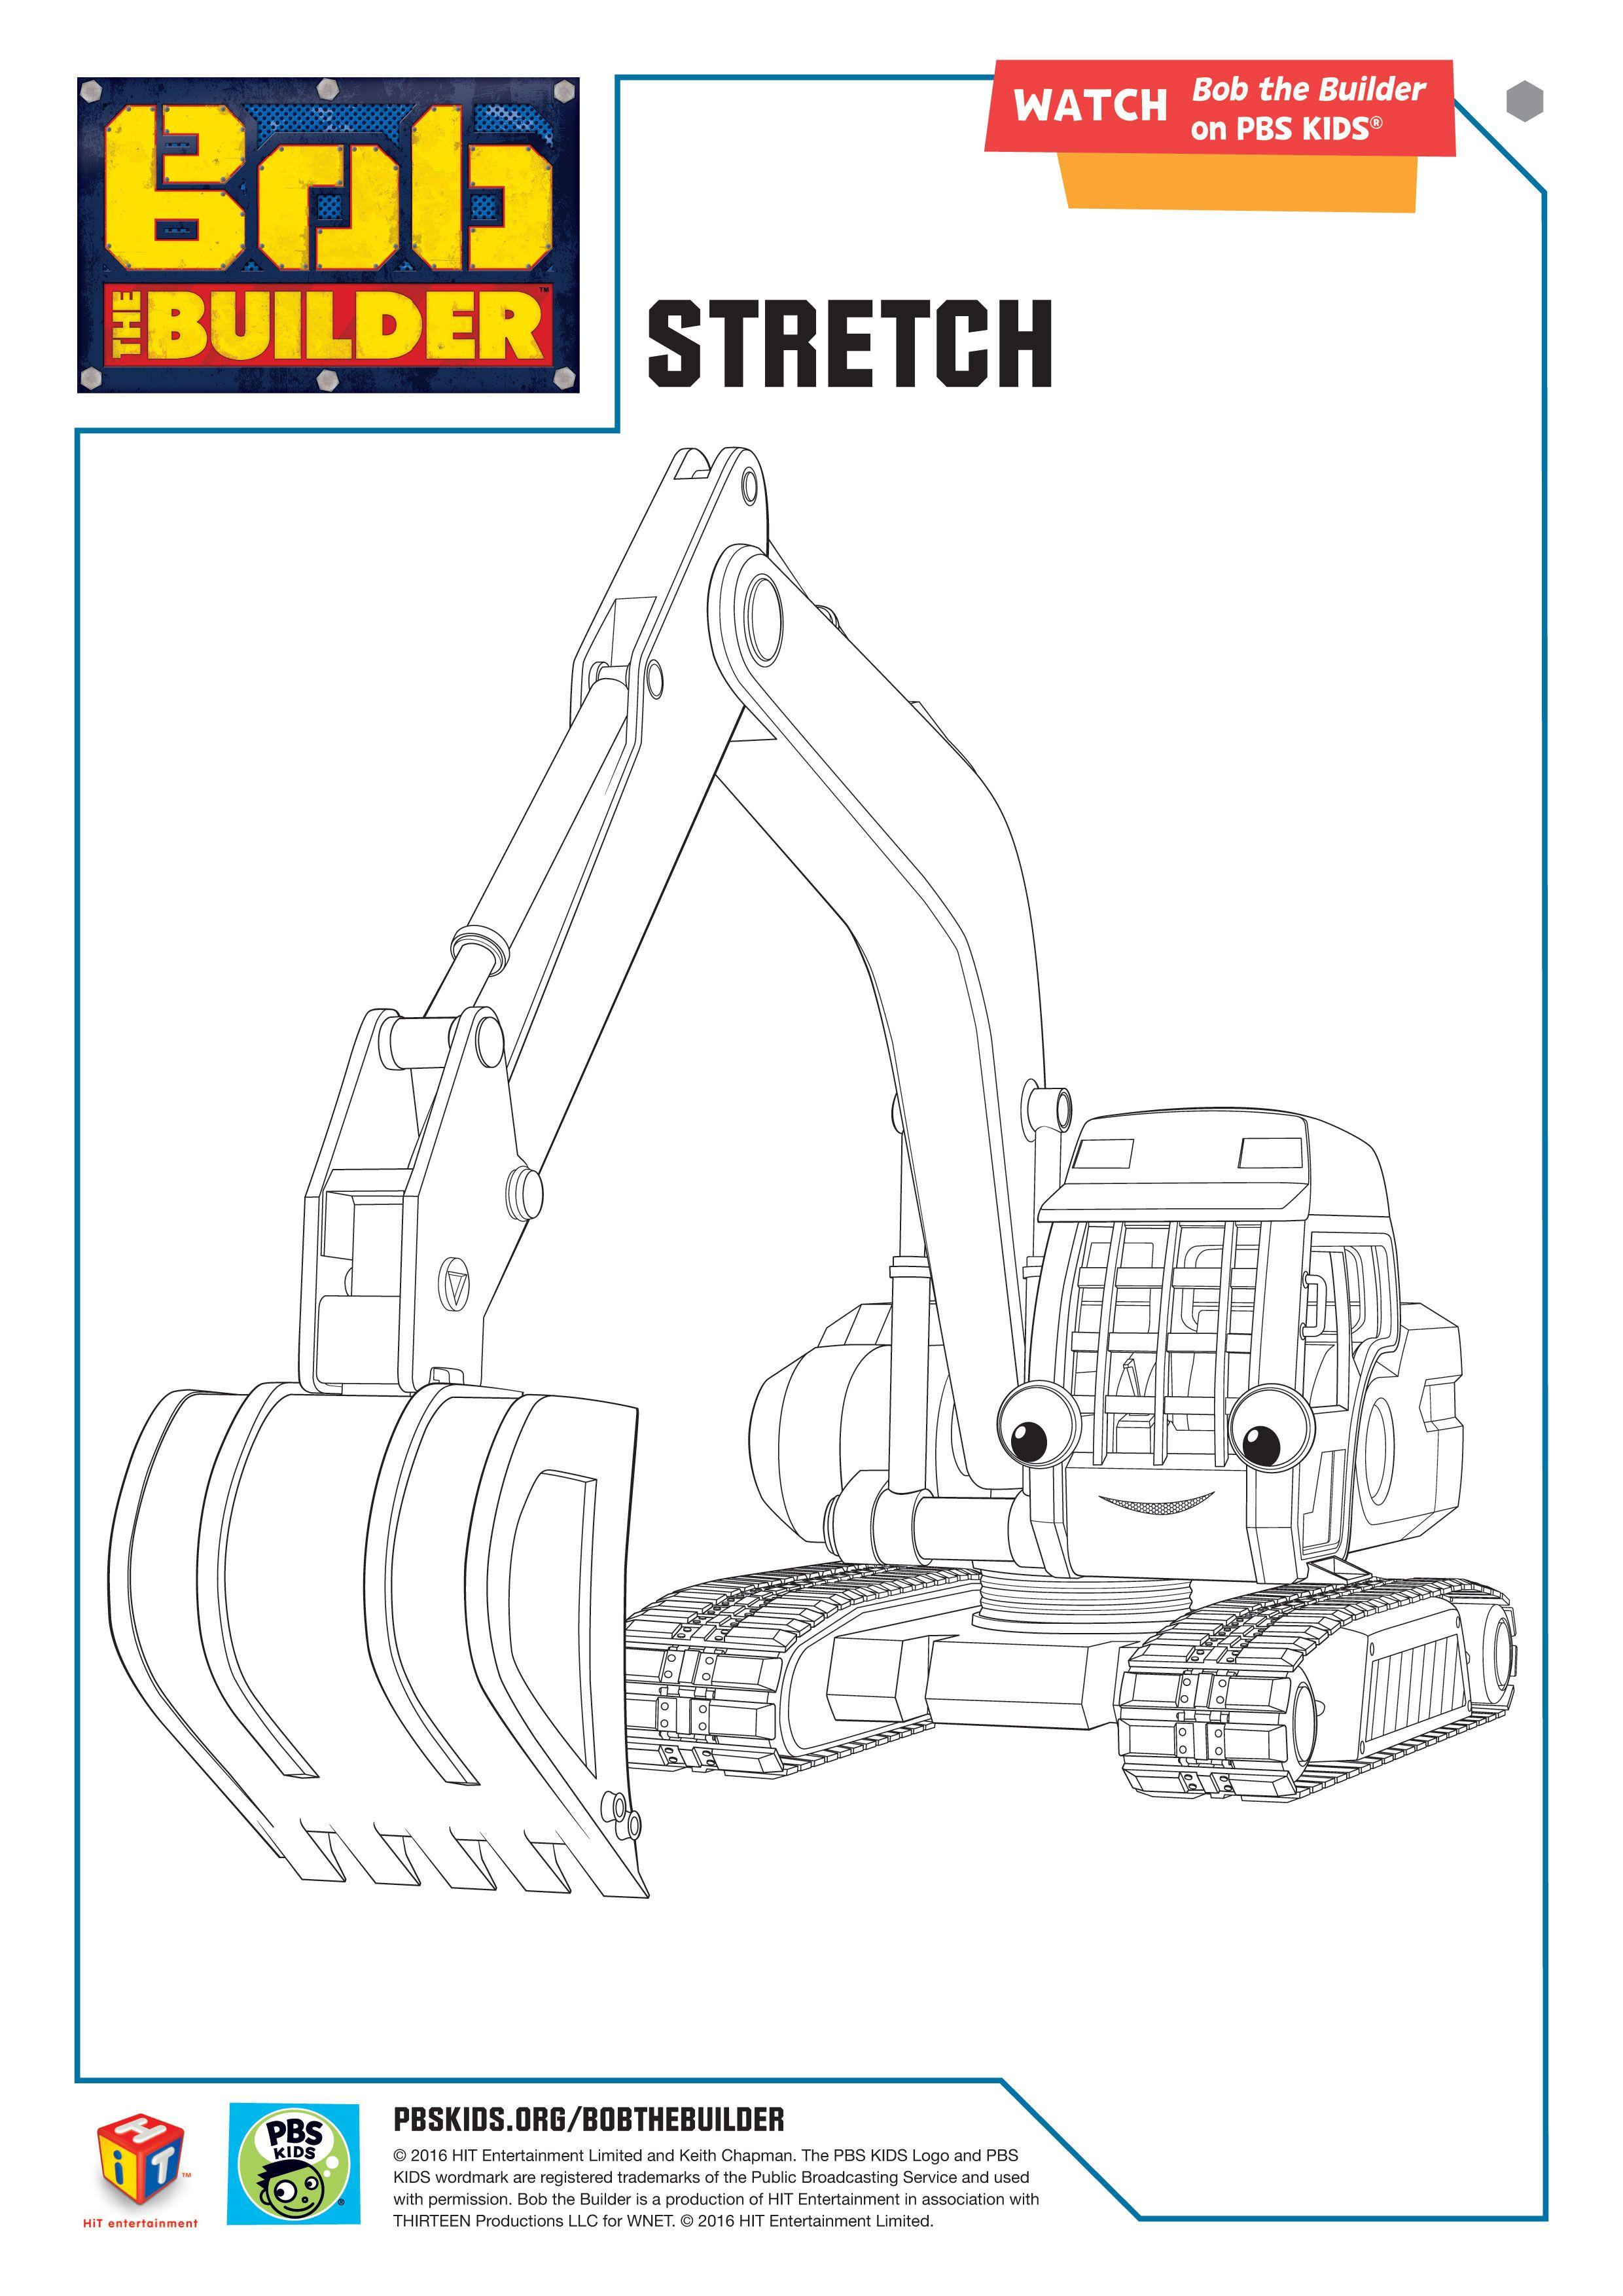 Bob the Builder coloring page: Stretch #BobtheBuilder #PBSKids ...